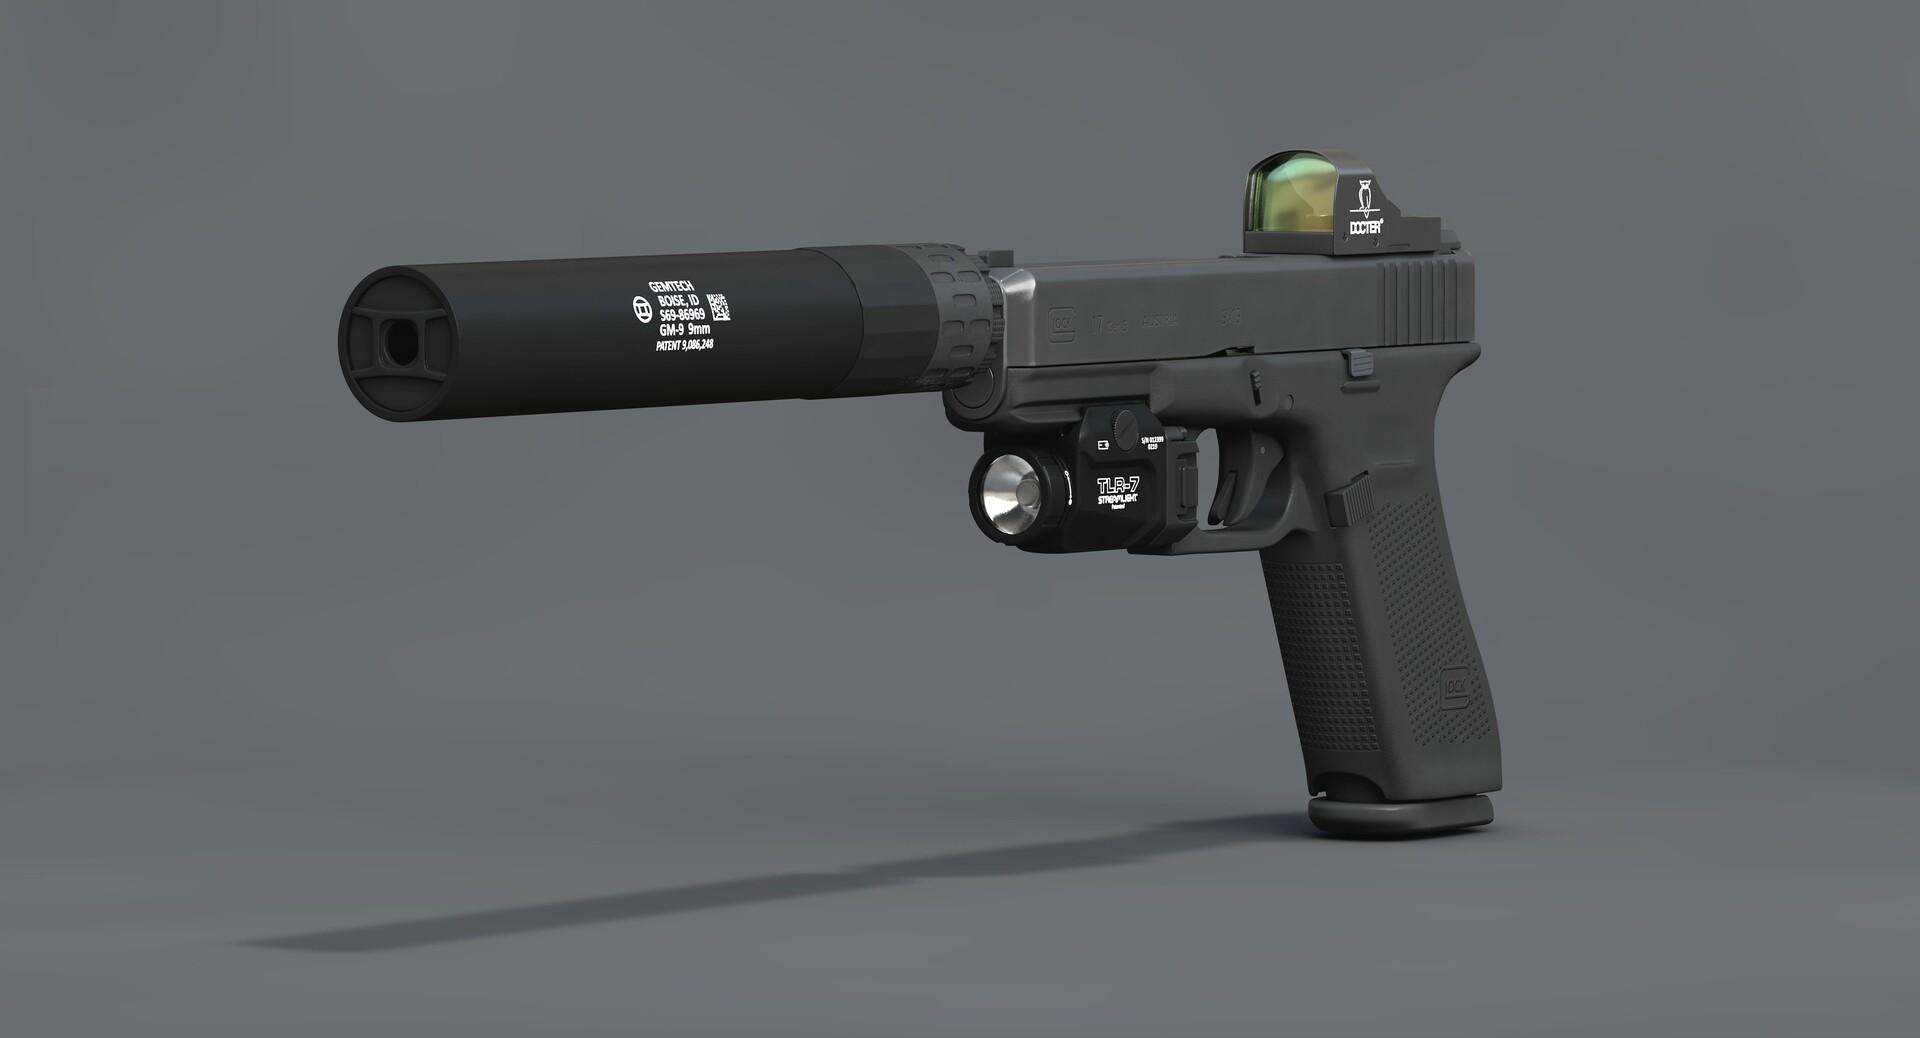 Vladimir Myagkiy - Glock 17 Gen 5 and Tactical kit